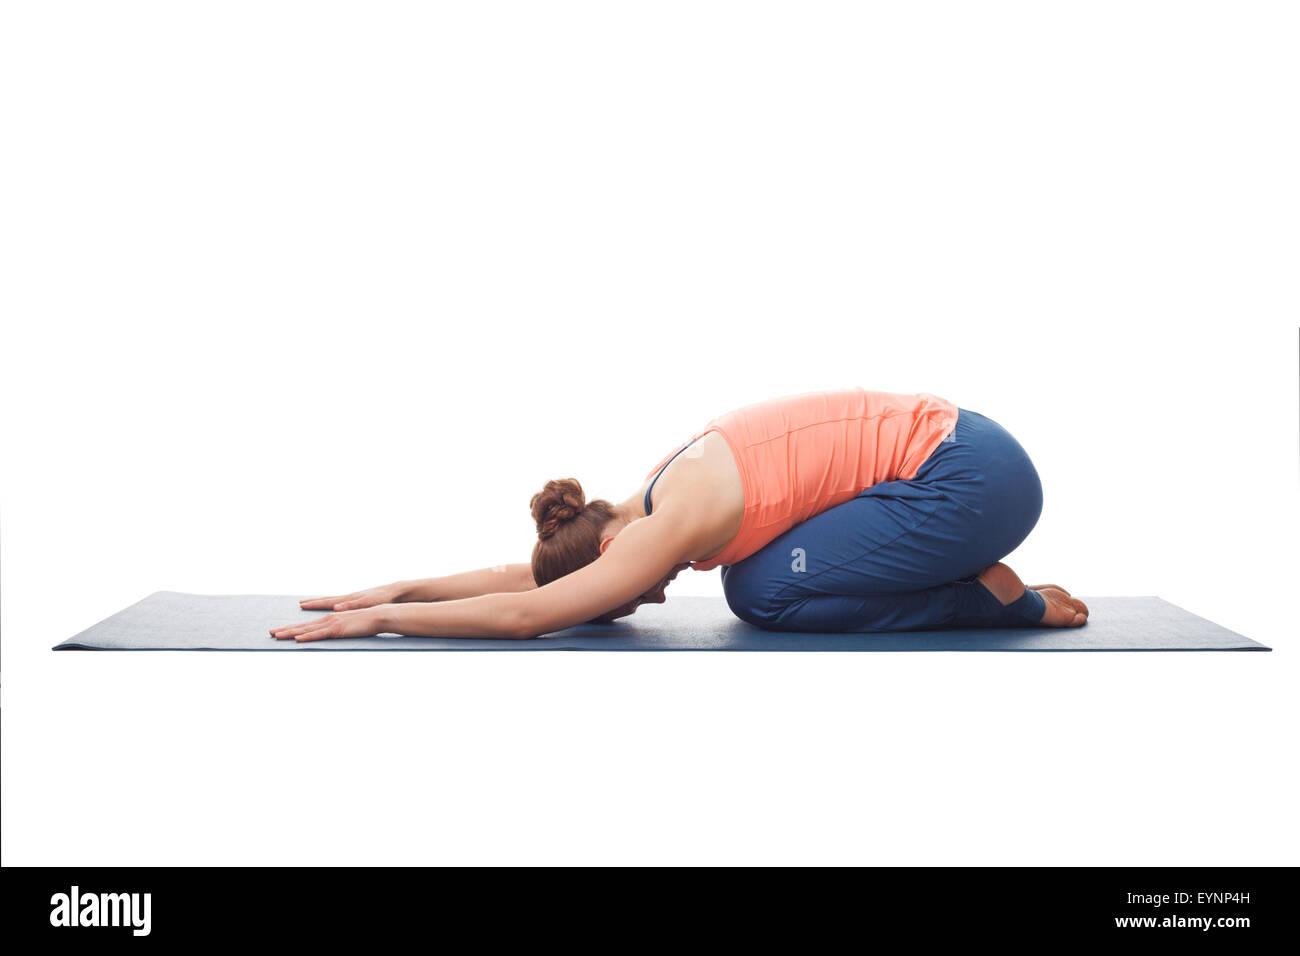 Beautiful sporty fit yogi girl practices yoga asana balasana - Stock Image